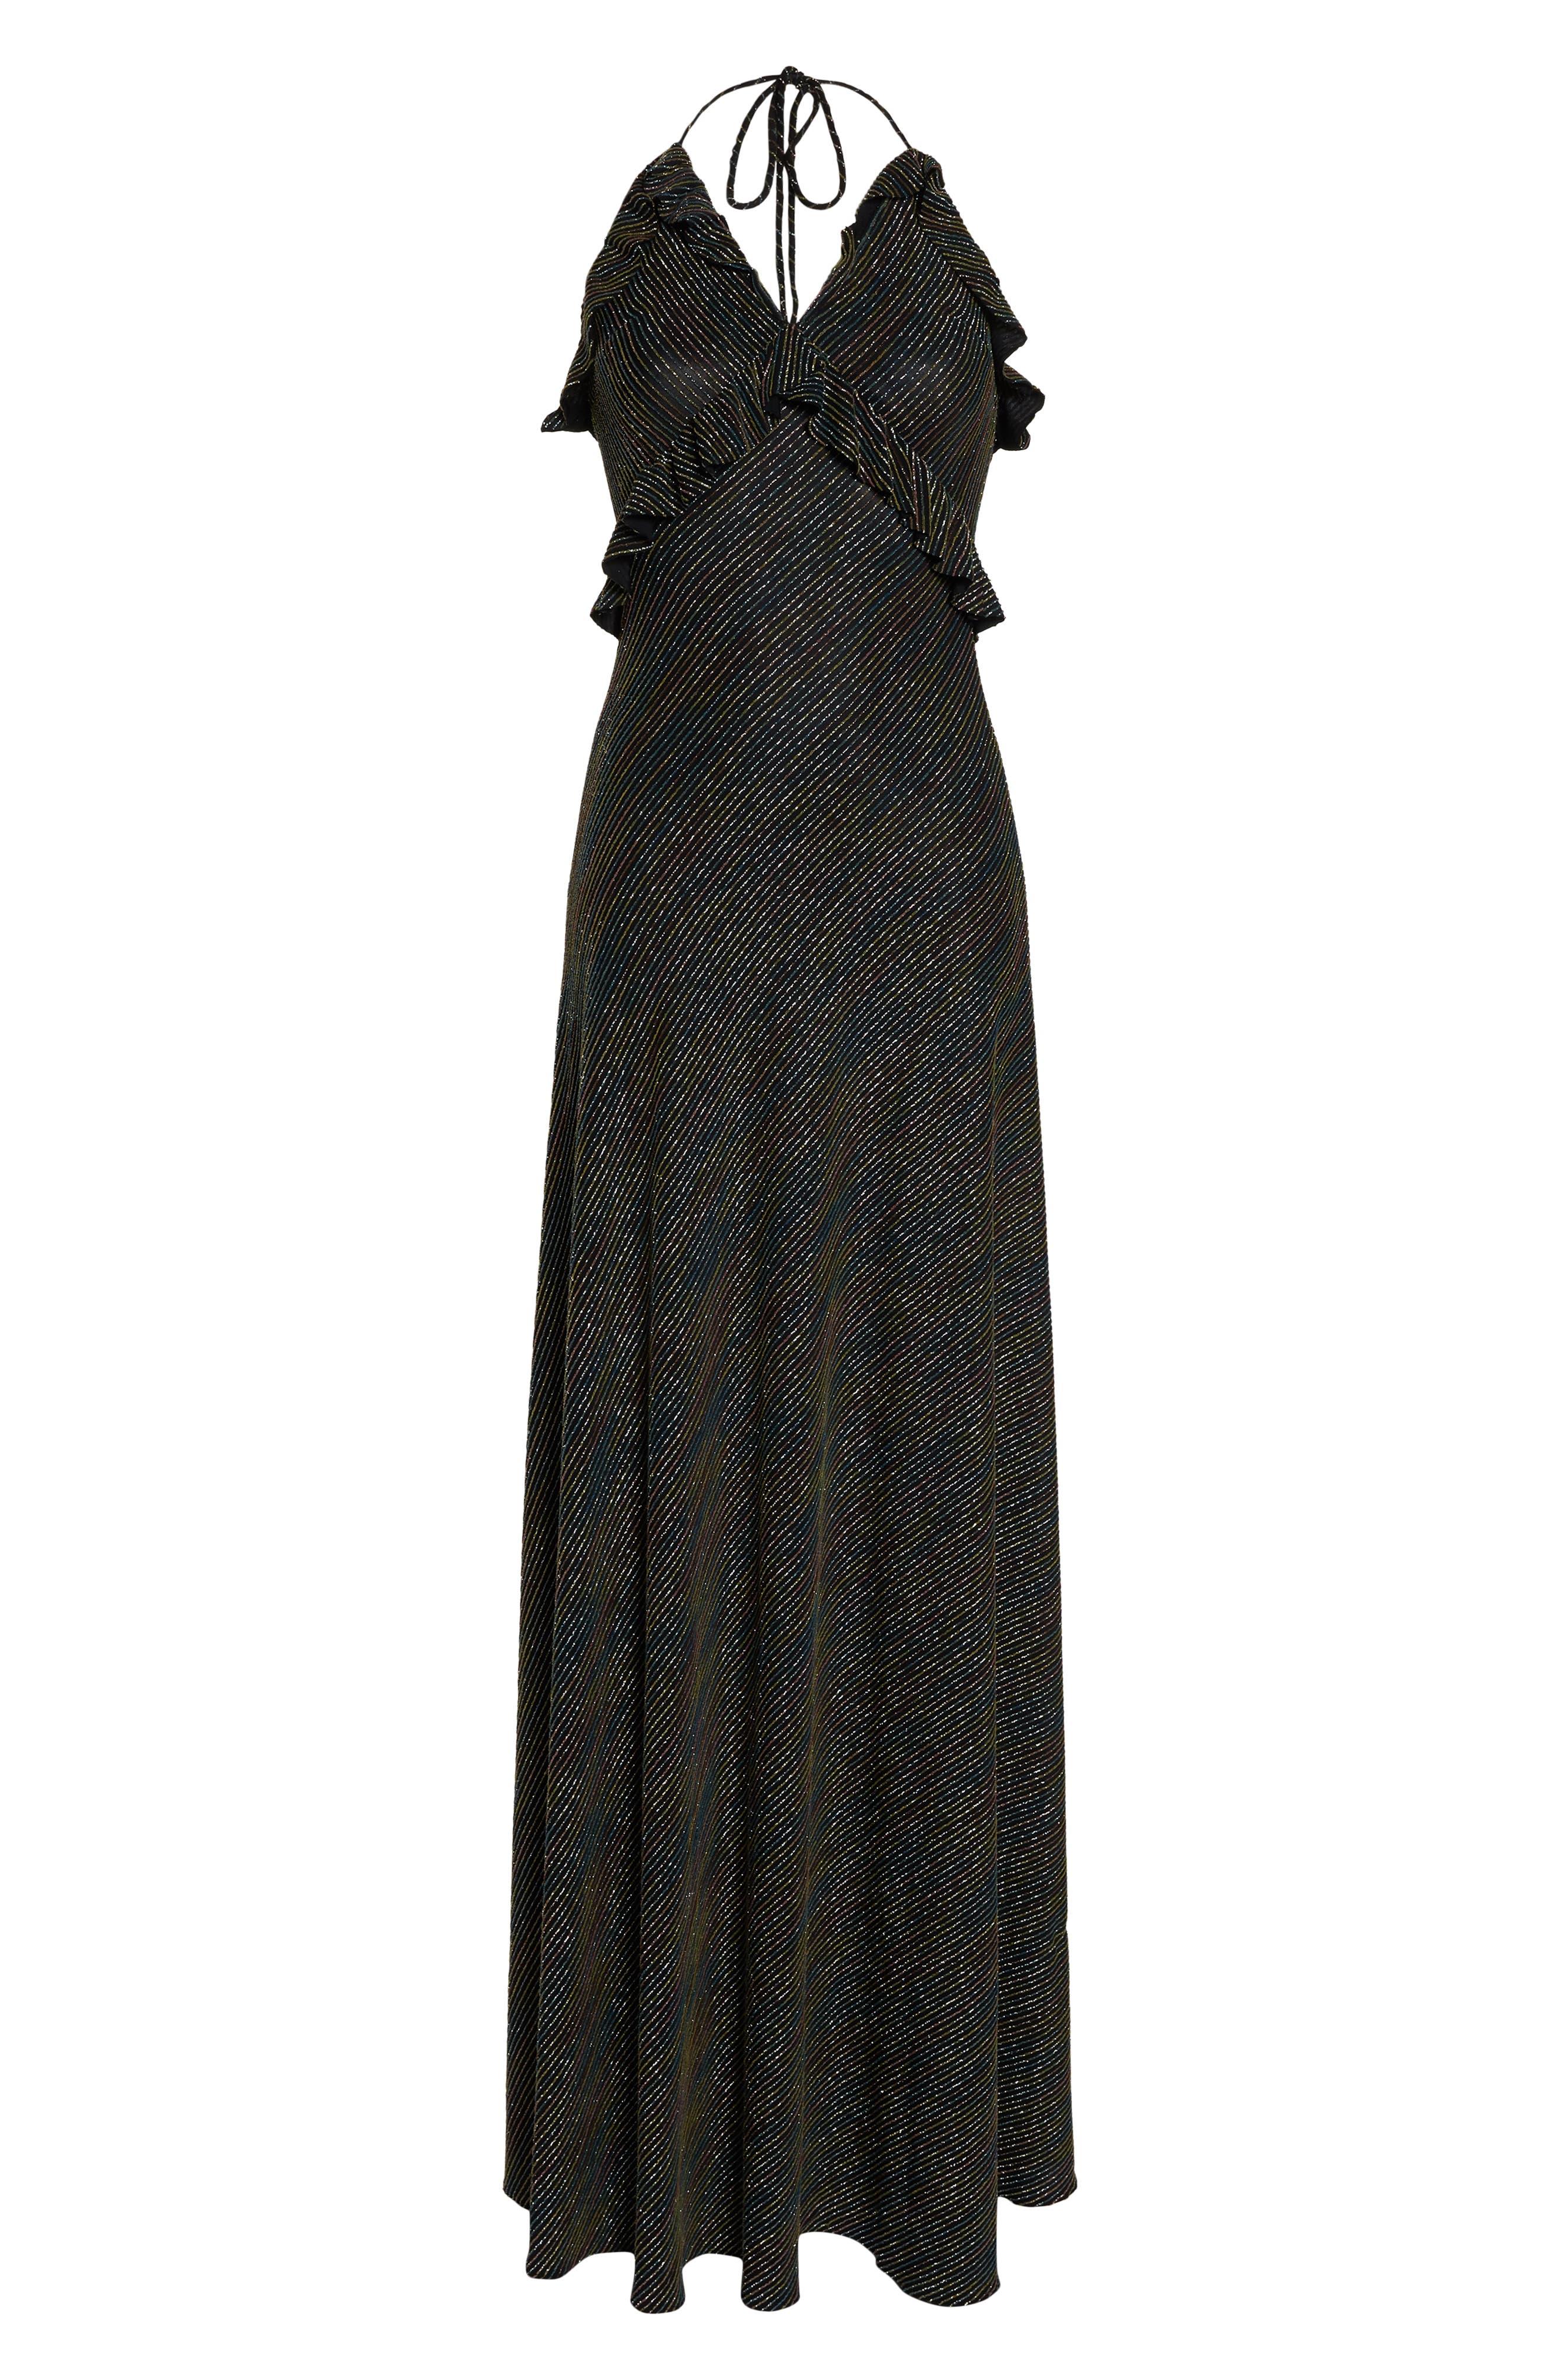 JILL JILL STUART,                             Marjan Metallic Knit Gown,                             Alternate thumbnail 6, color,                             SILVER MULTI